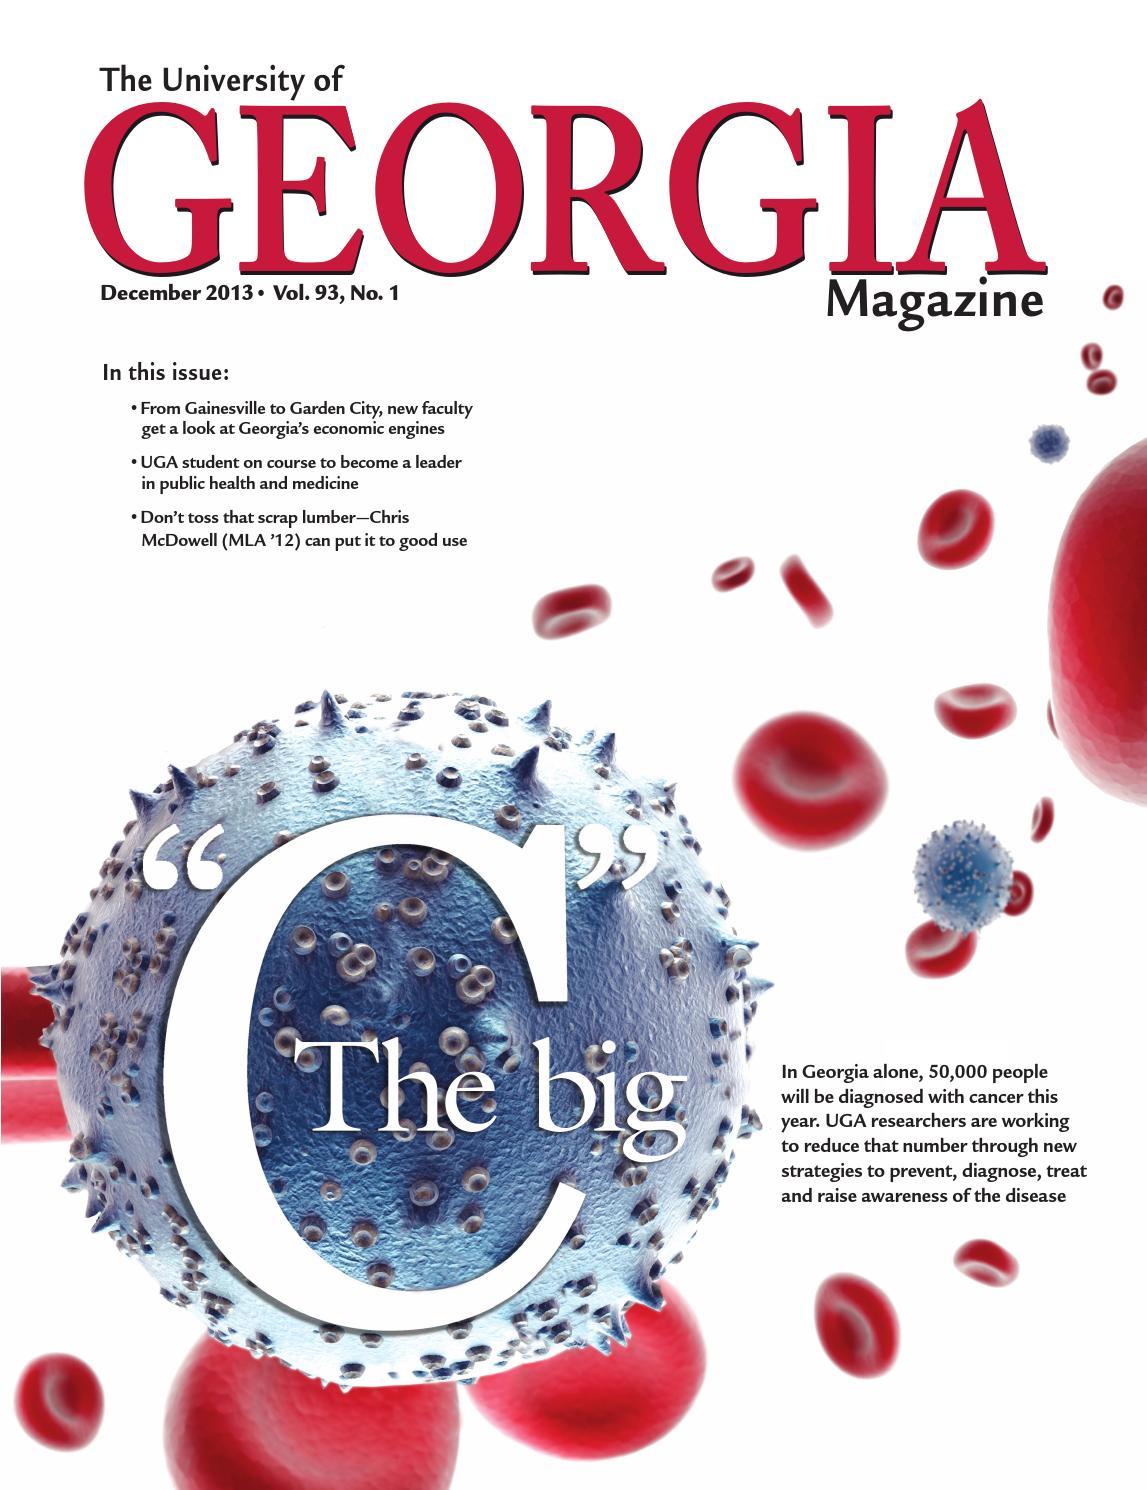 The university of georgia magazine december 2013 by university of the university of georgia magazine december 2013 by university of georgia alumni magazine issuu fandeluxe Gallery